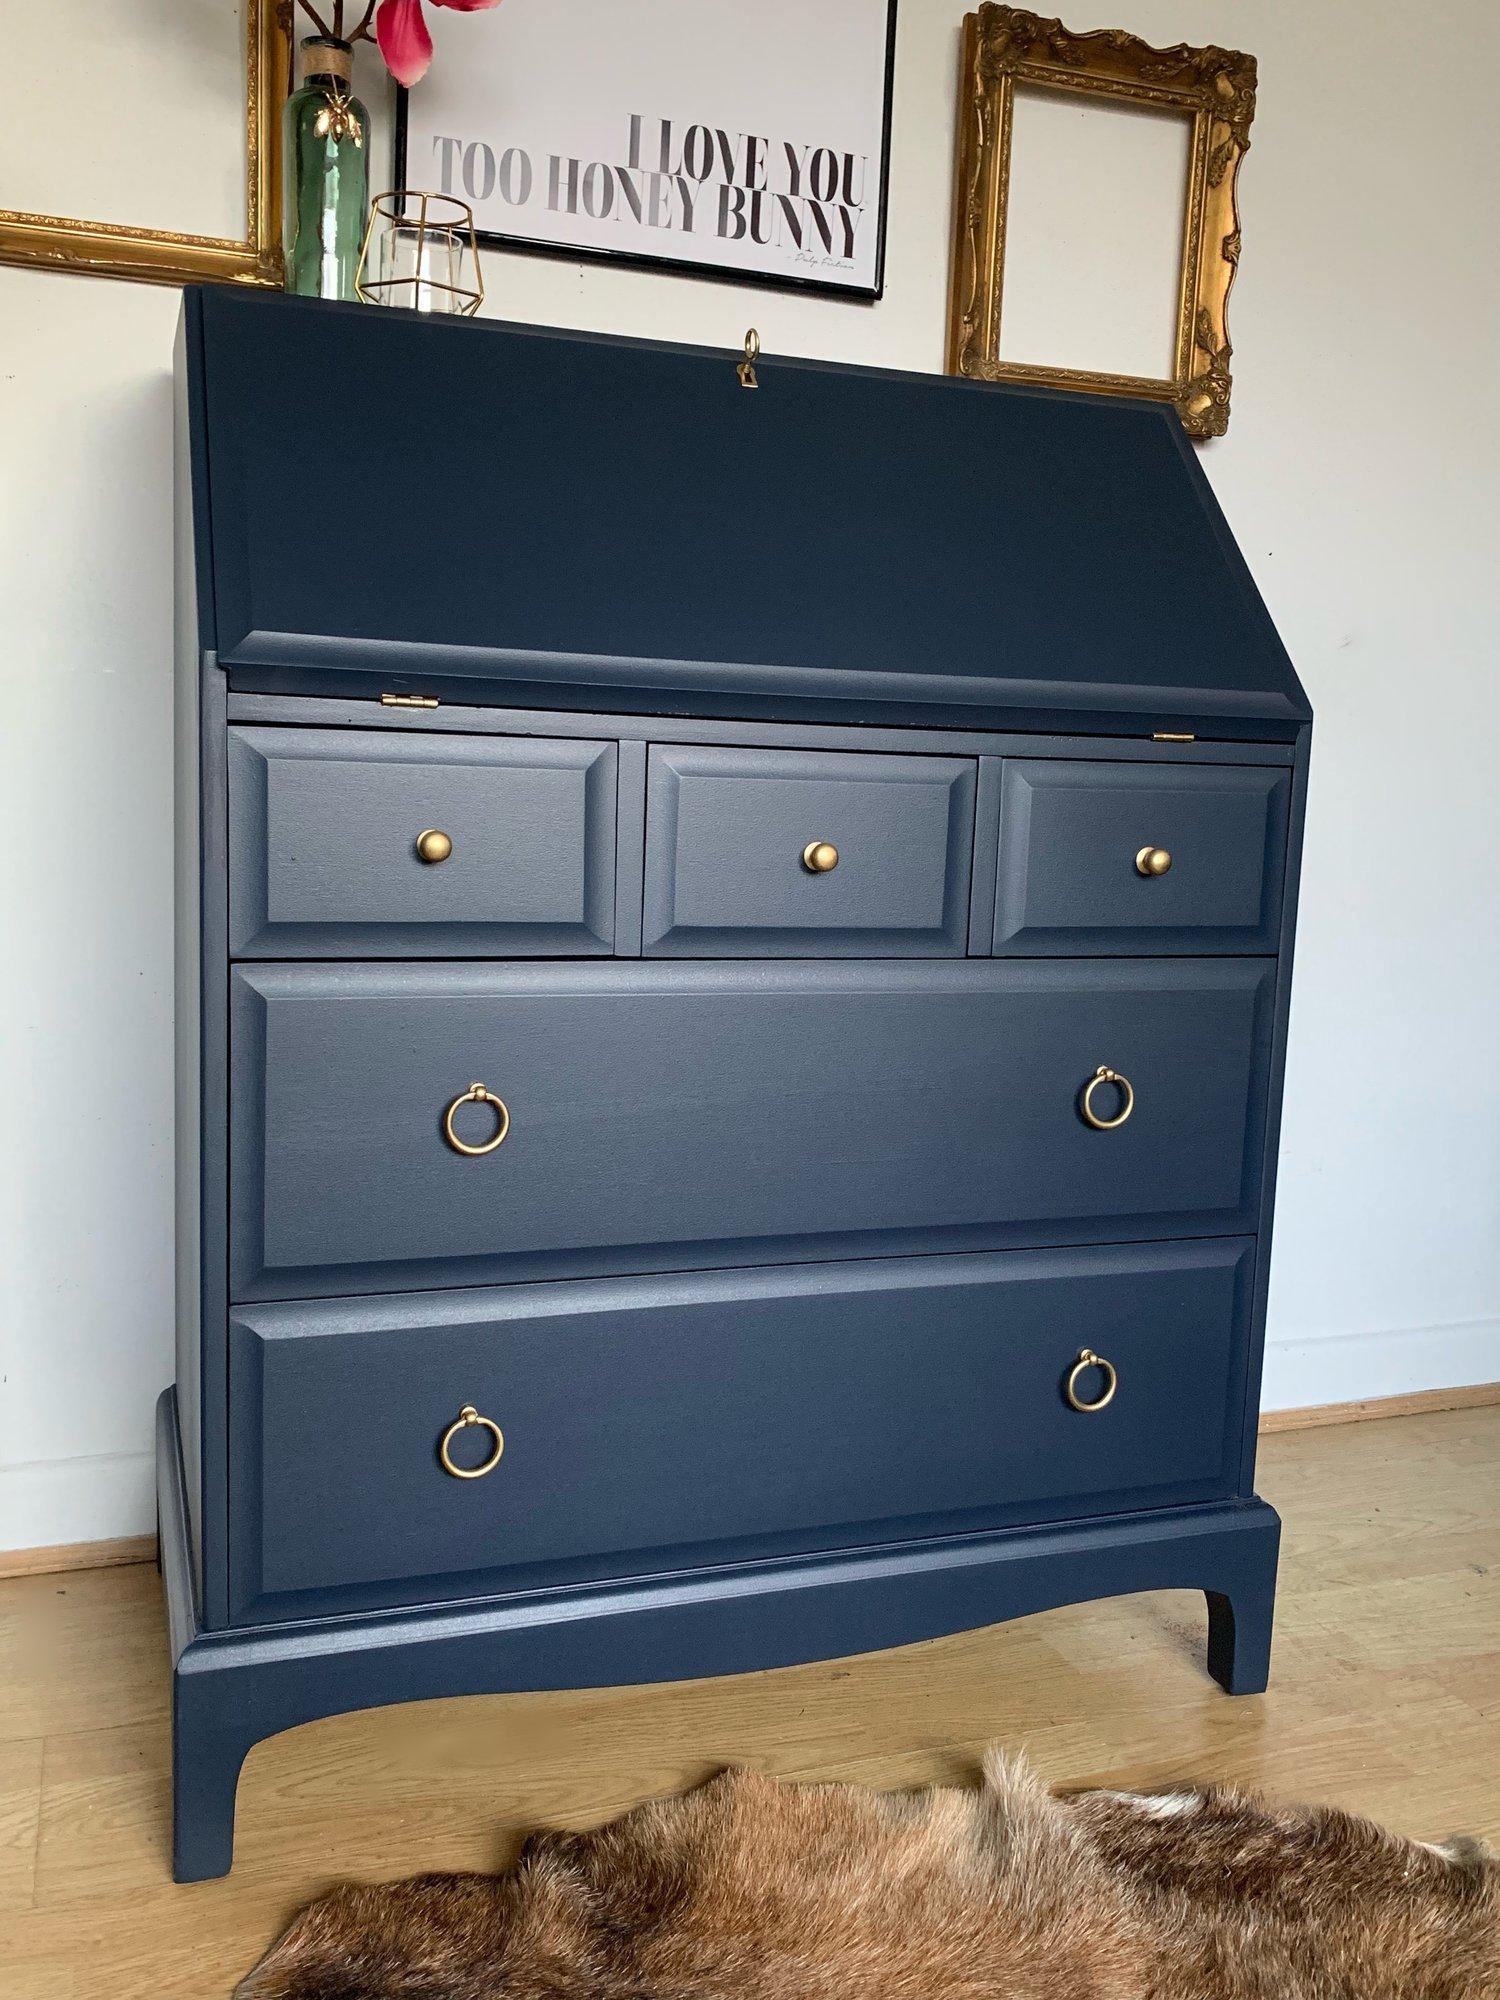 Image of Stunning dark blue bureau desk with key